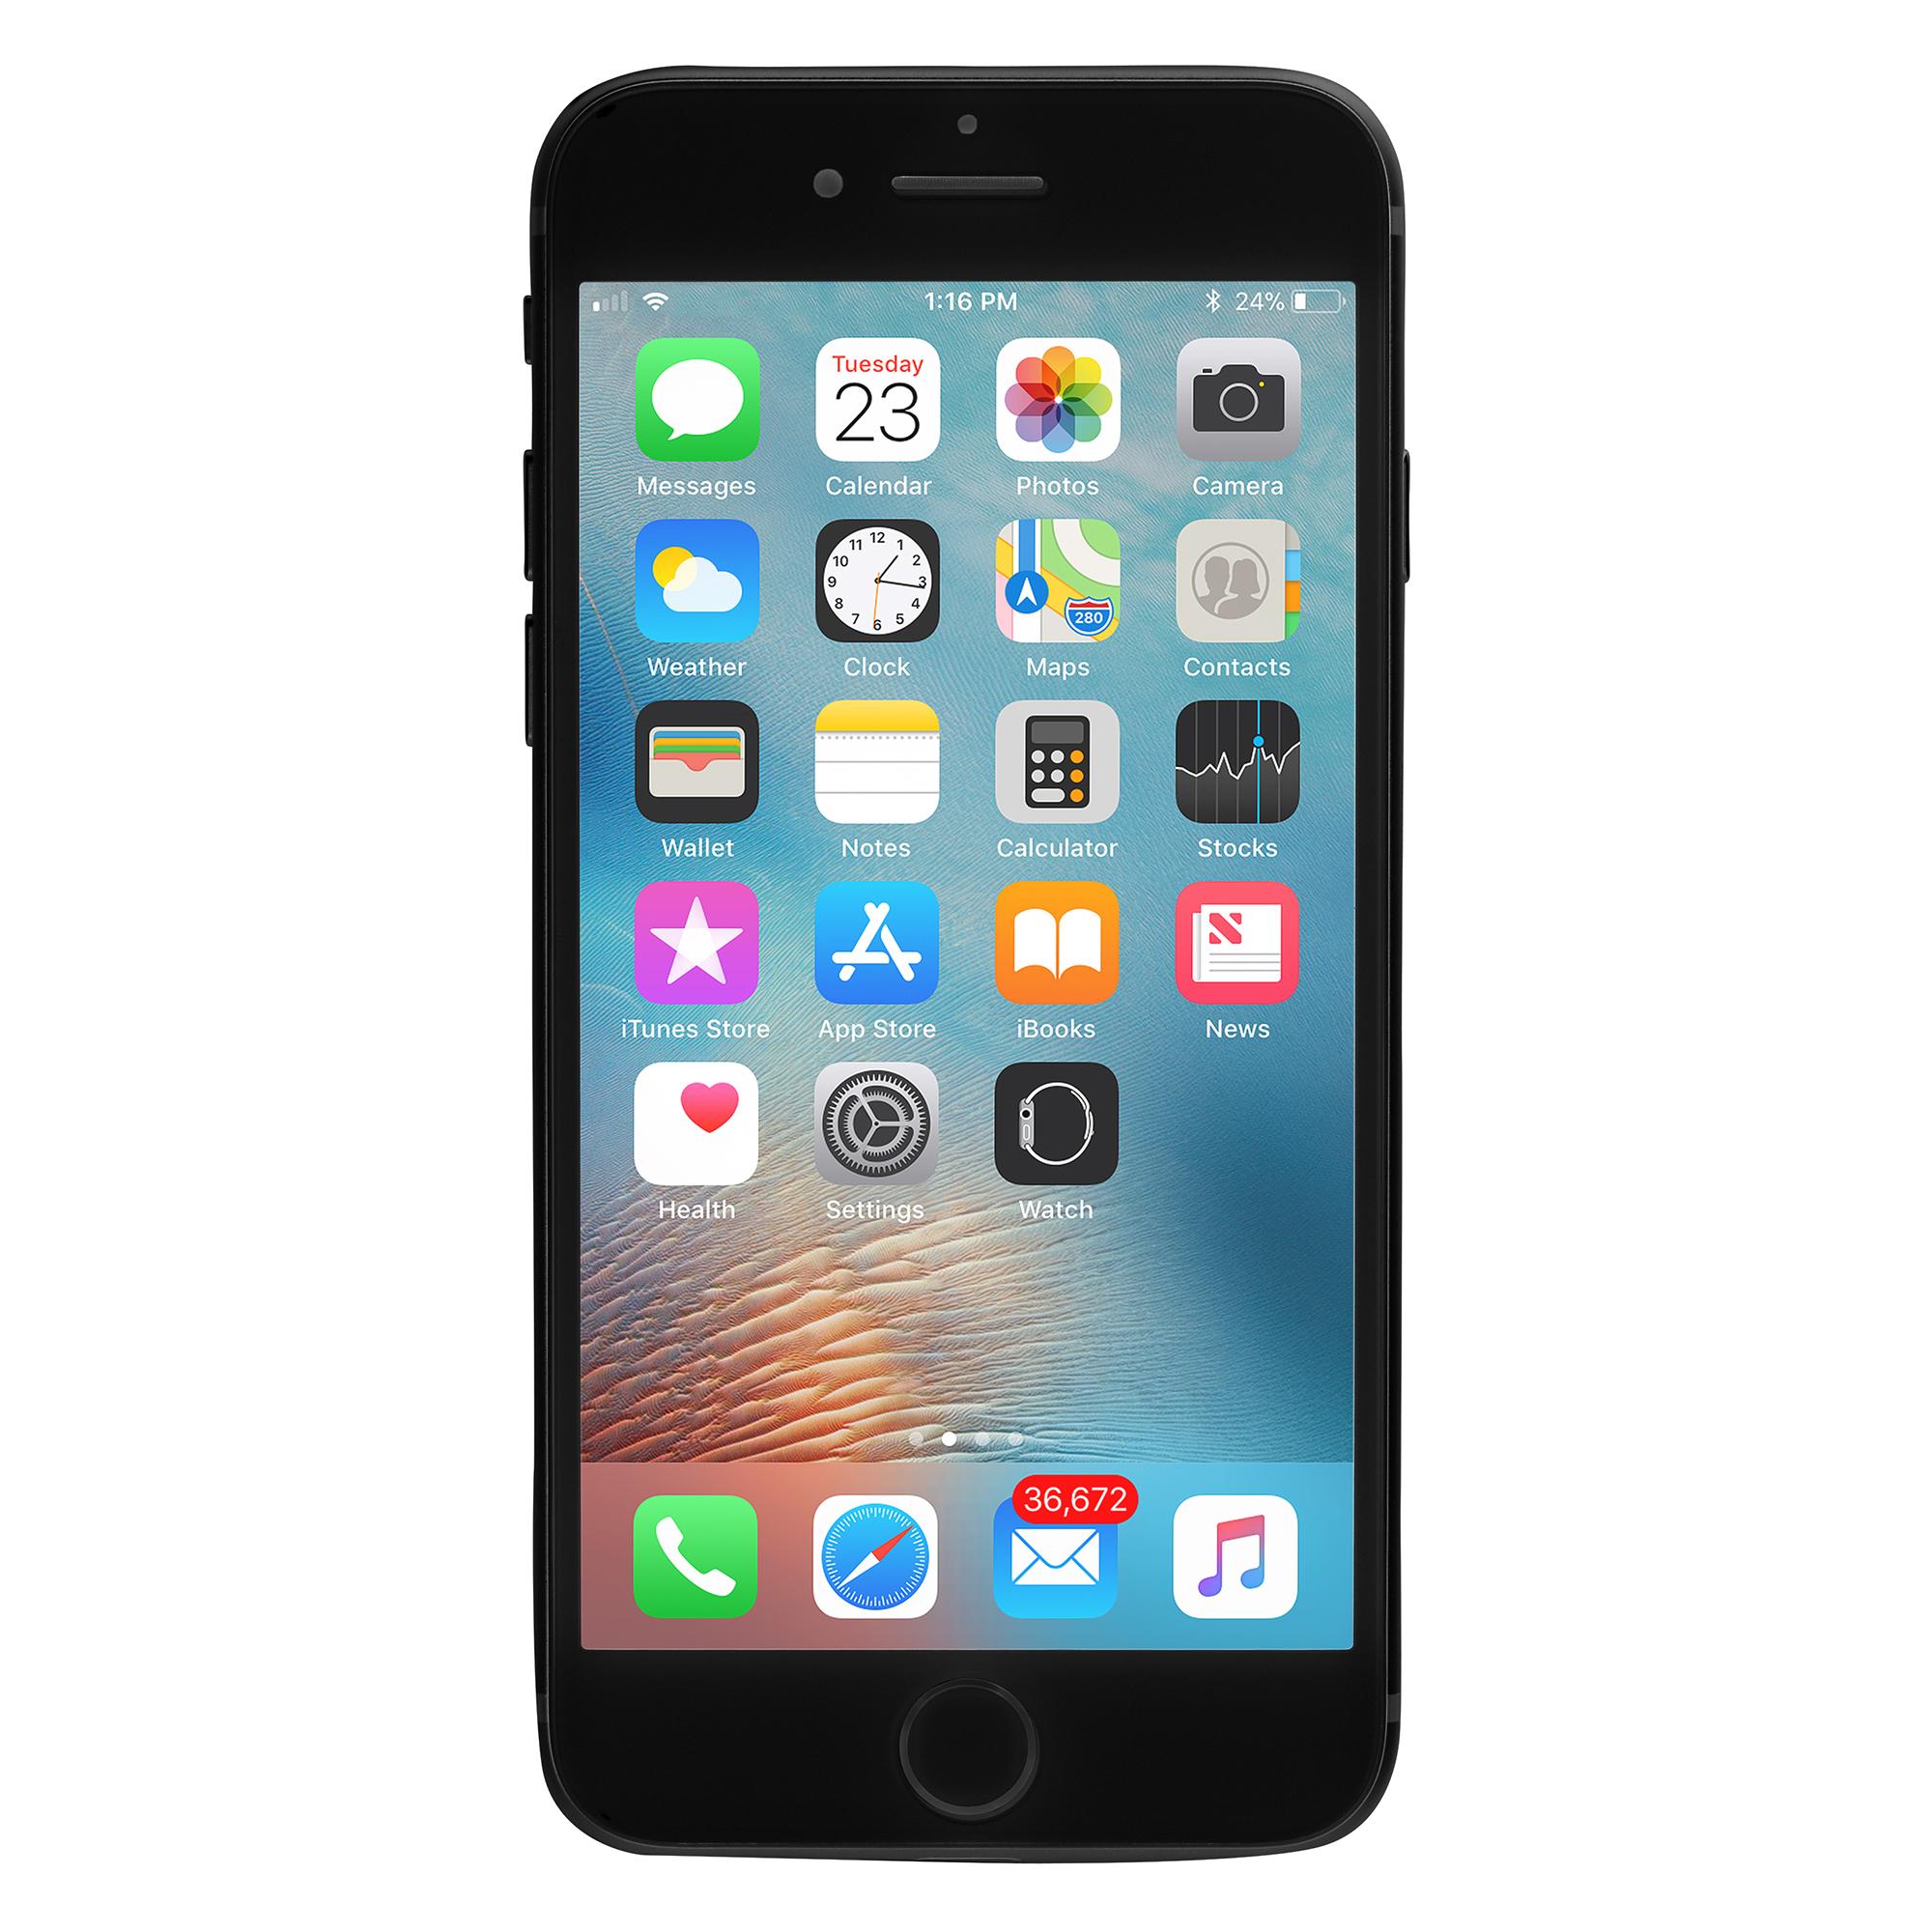 Apple-iPhone-7-a1778-32GB-GSM-Unlocked